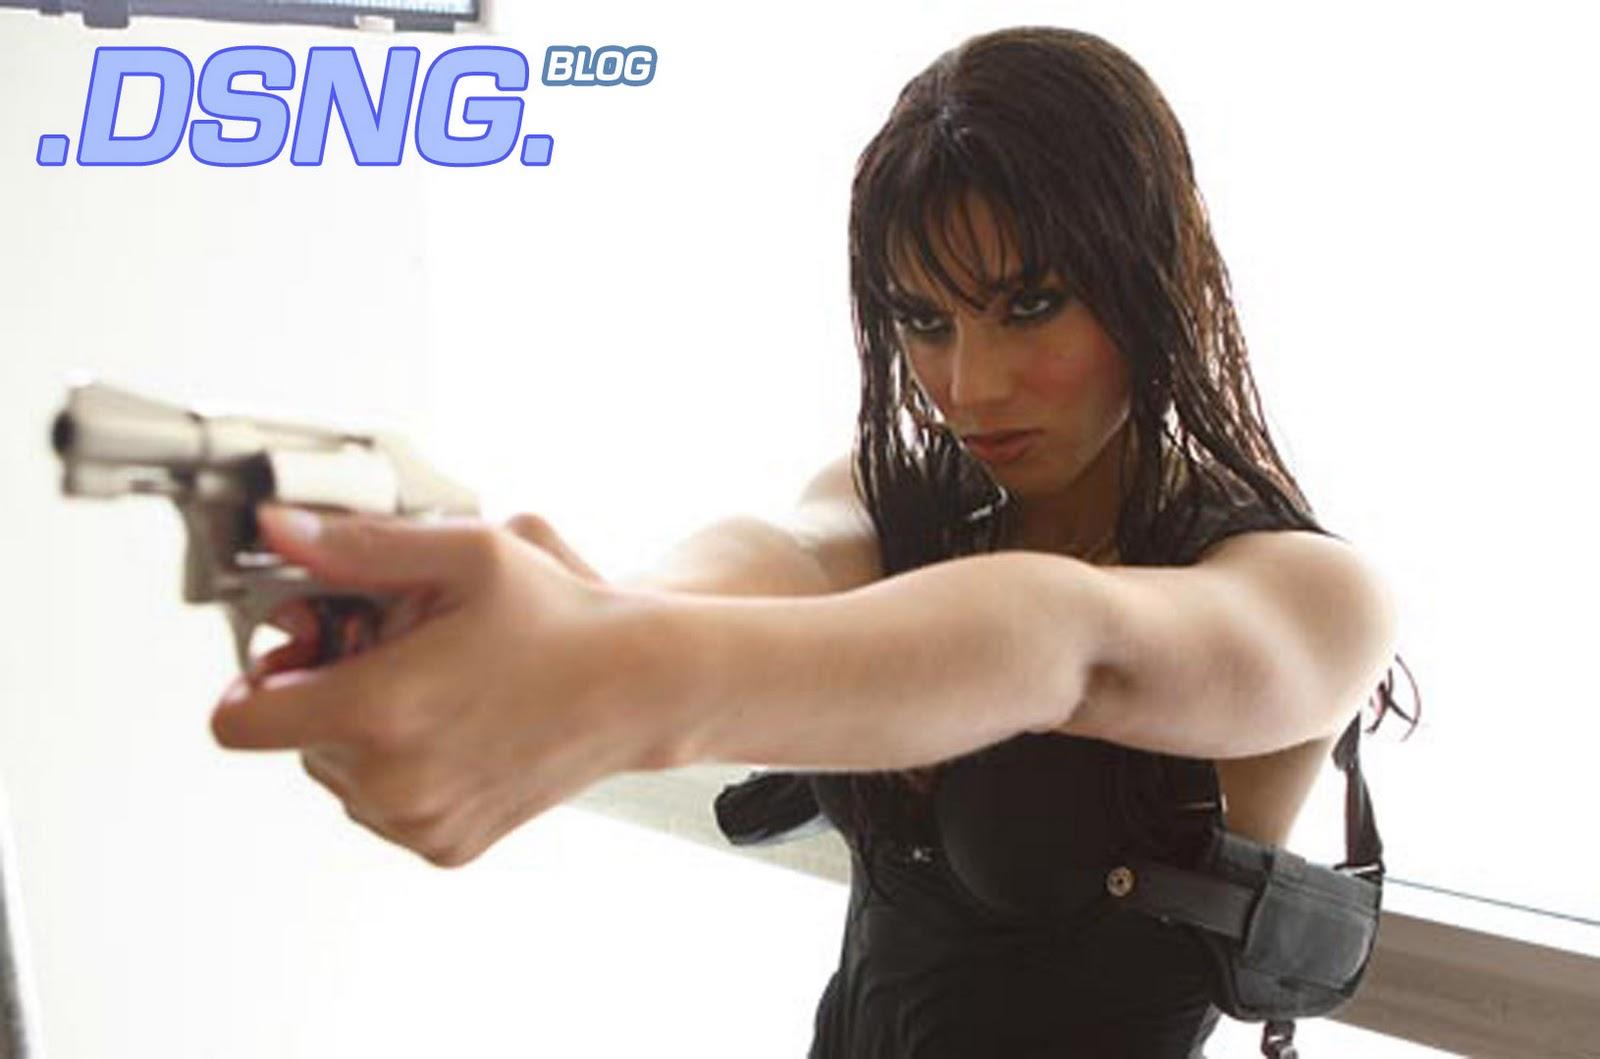 http://3.bp.blogspot.com/-a7wVlX0b8Wg/TnkGYg_SuXI/AAAAAAAABU0/CqQz8cJiX-E/s1600/ALICIA+KEYS+SEXY+PAWG+THICK+SHOT+SHOOTS+SMOKIN+ACES+ACTION+SCENE+HANDUN+REVOLVER+GUN+2.jpg